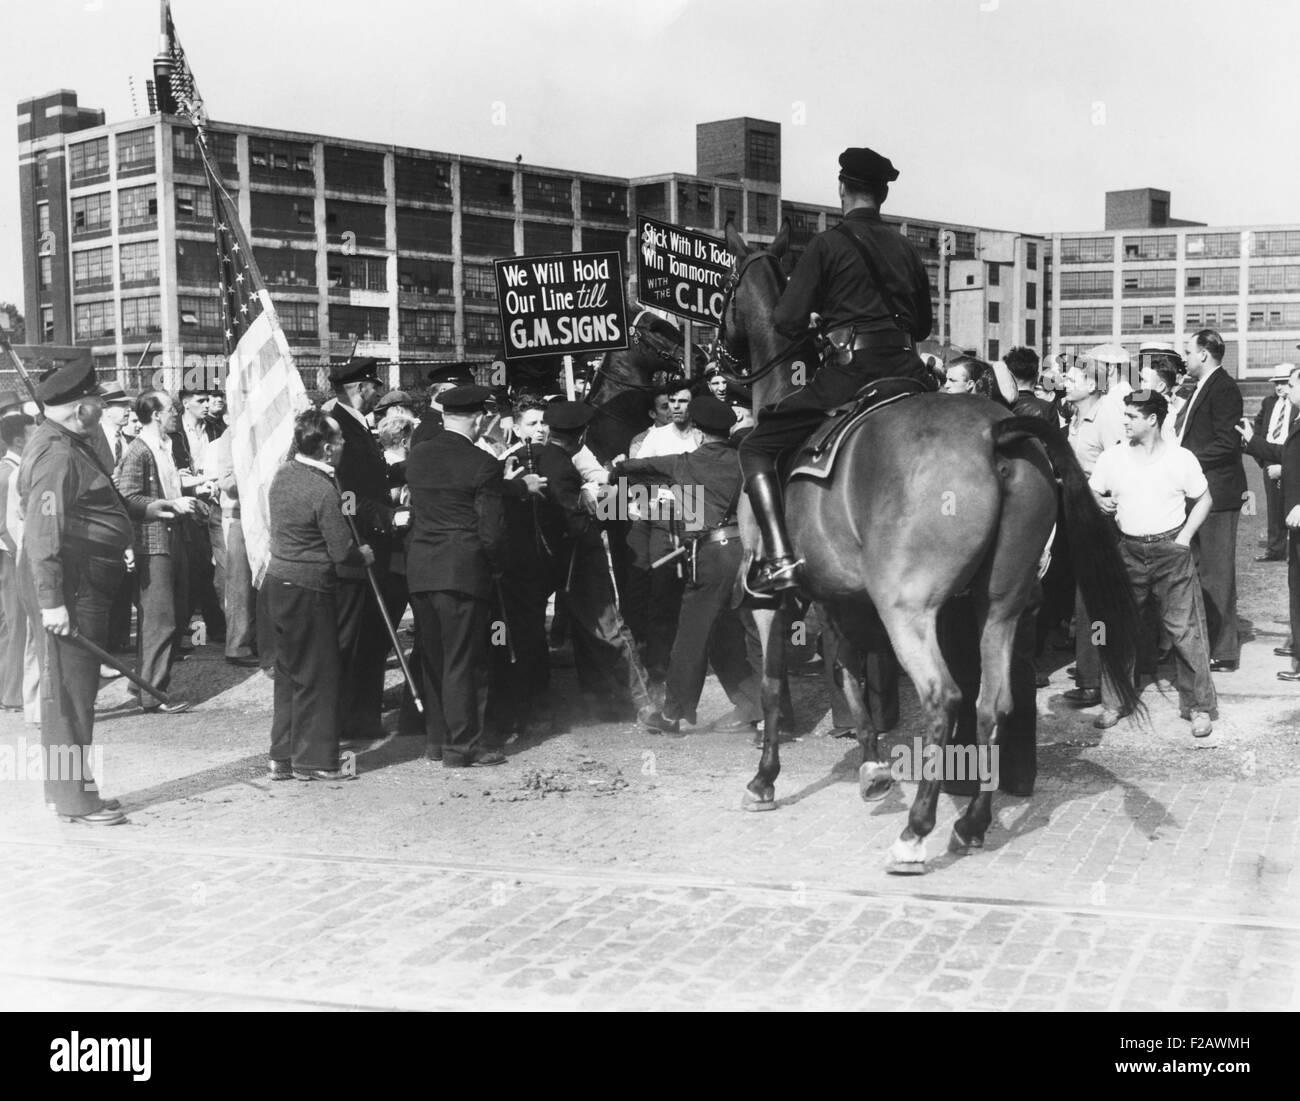 Skirmish between police and strikers at the 'tool and die strike' against General Motors. Detroit, July - Stock Image